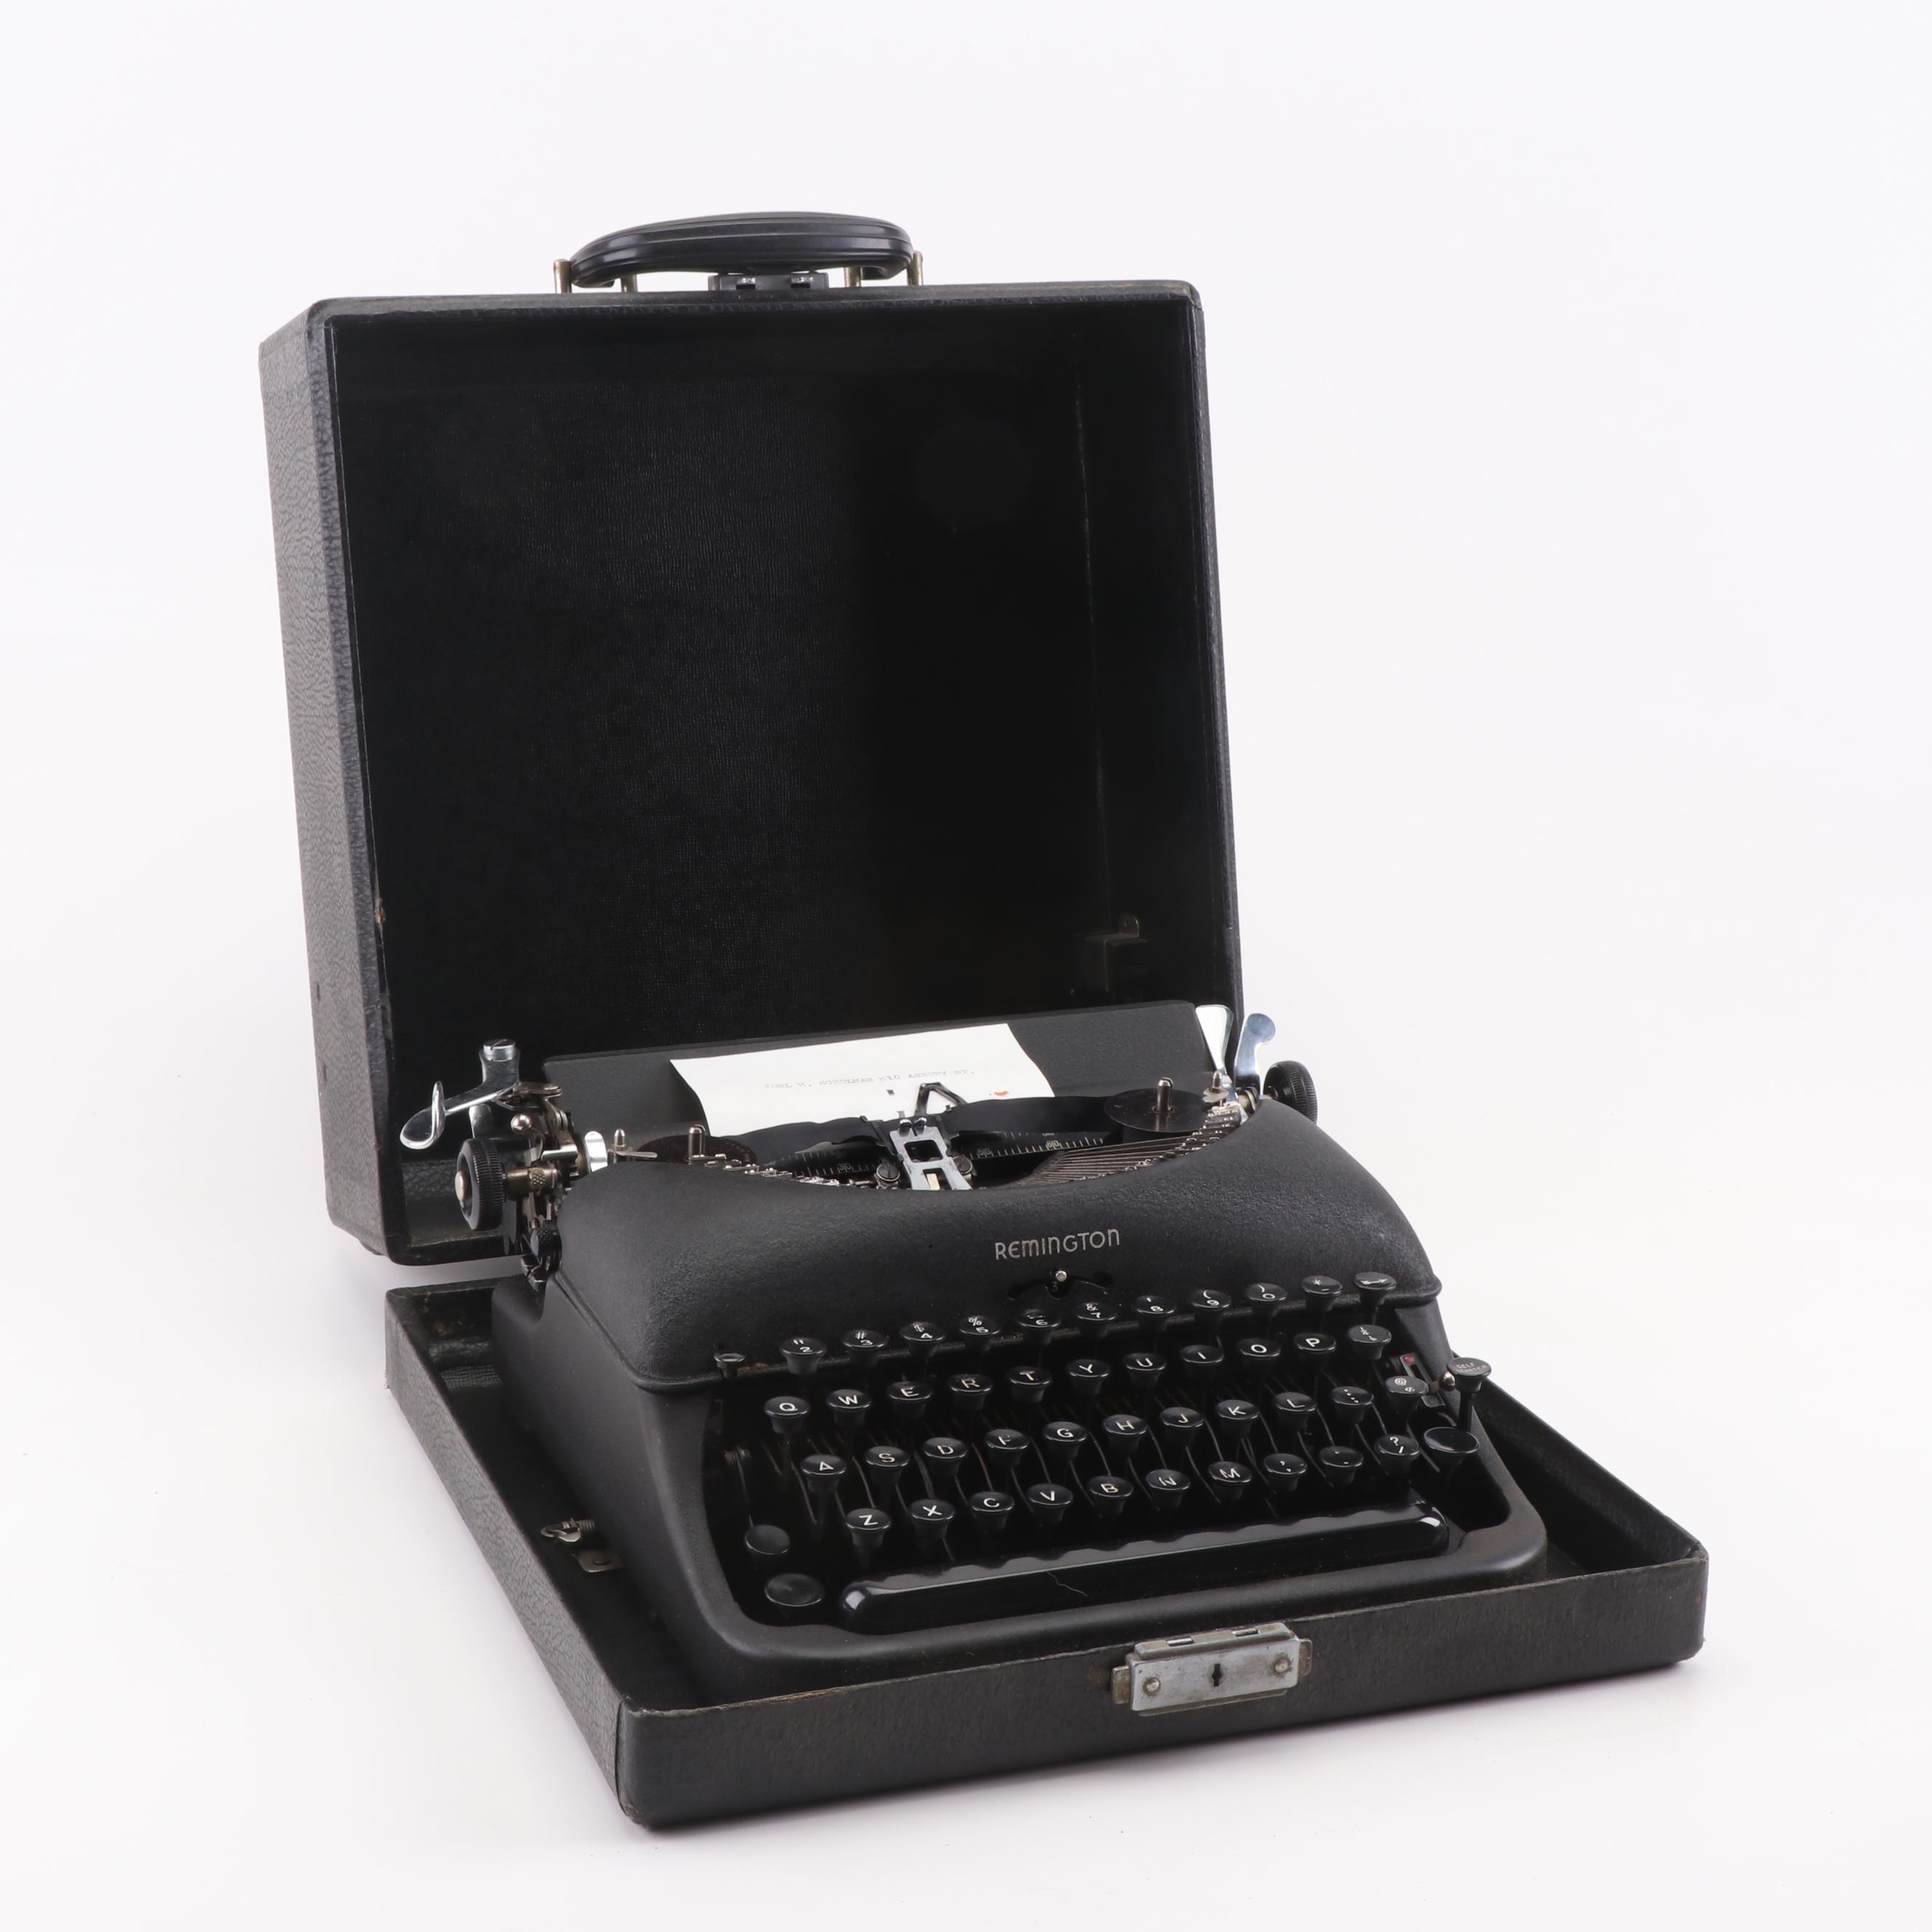 Remington De Luxe Model 5 Typewriter with Case, 1940s